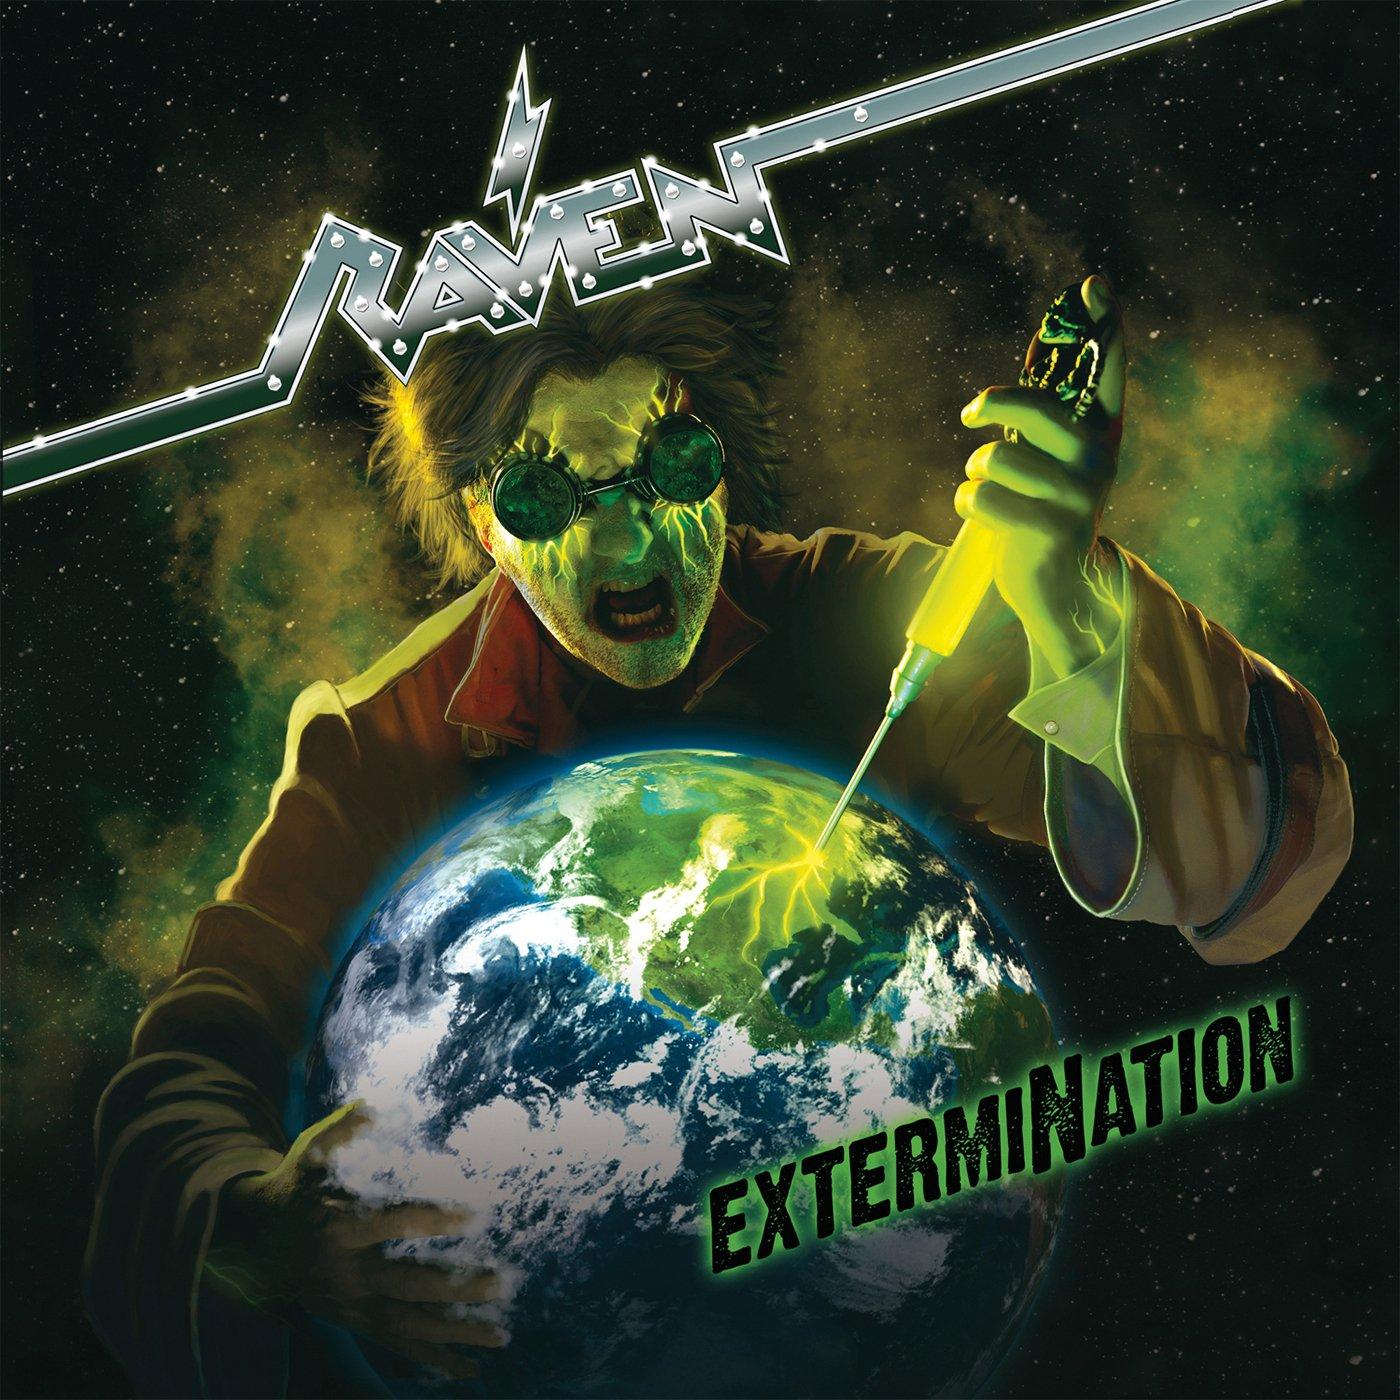 Vinilo : Raven - Extermination (With CD, 3PC)